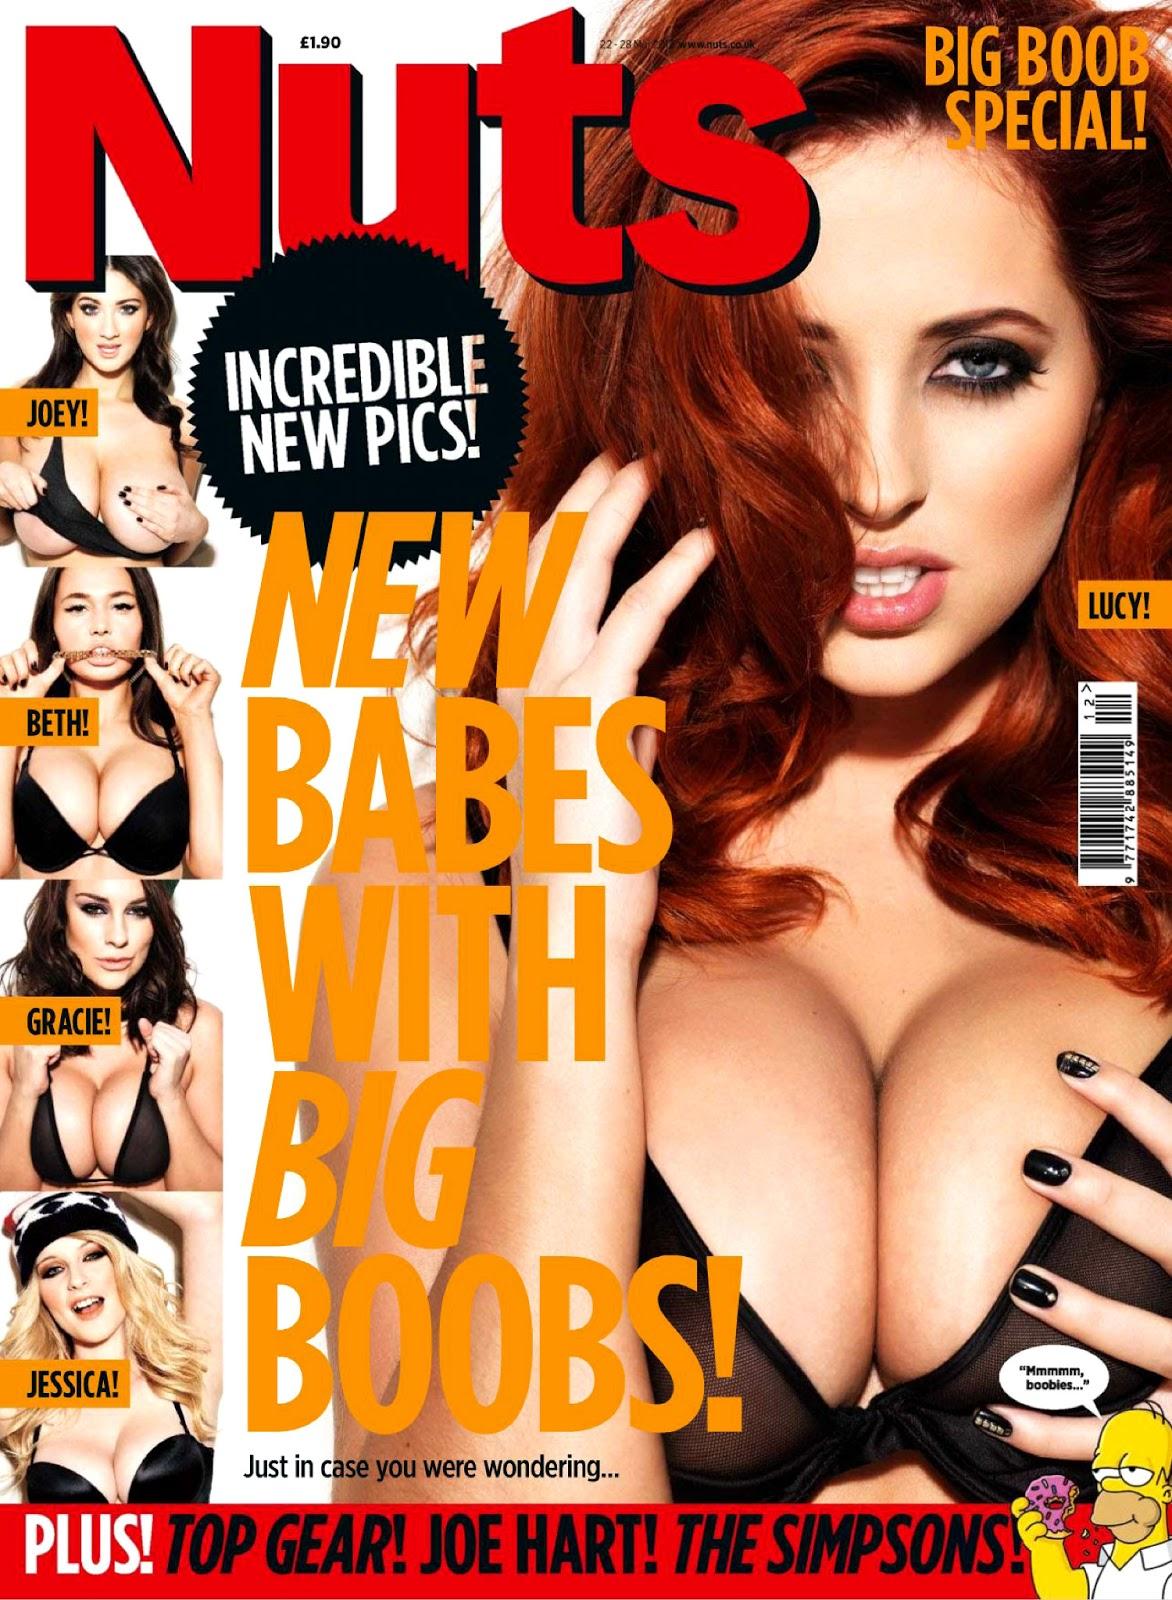 http://3.bp.blogspot.com/-pPXfbnqpAQk/UUtRBFBboWI/AAAAAAAAW90/C7_y_kdnhuE/s1600/New_Babes_with_Big_Boobs_NutsUK_220313_01.jpg